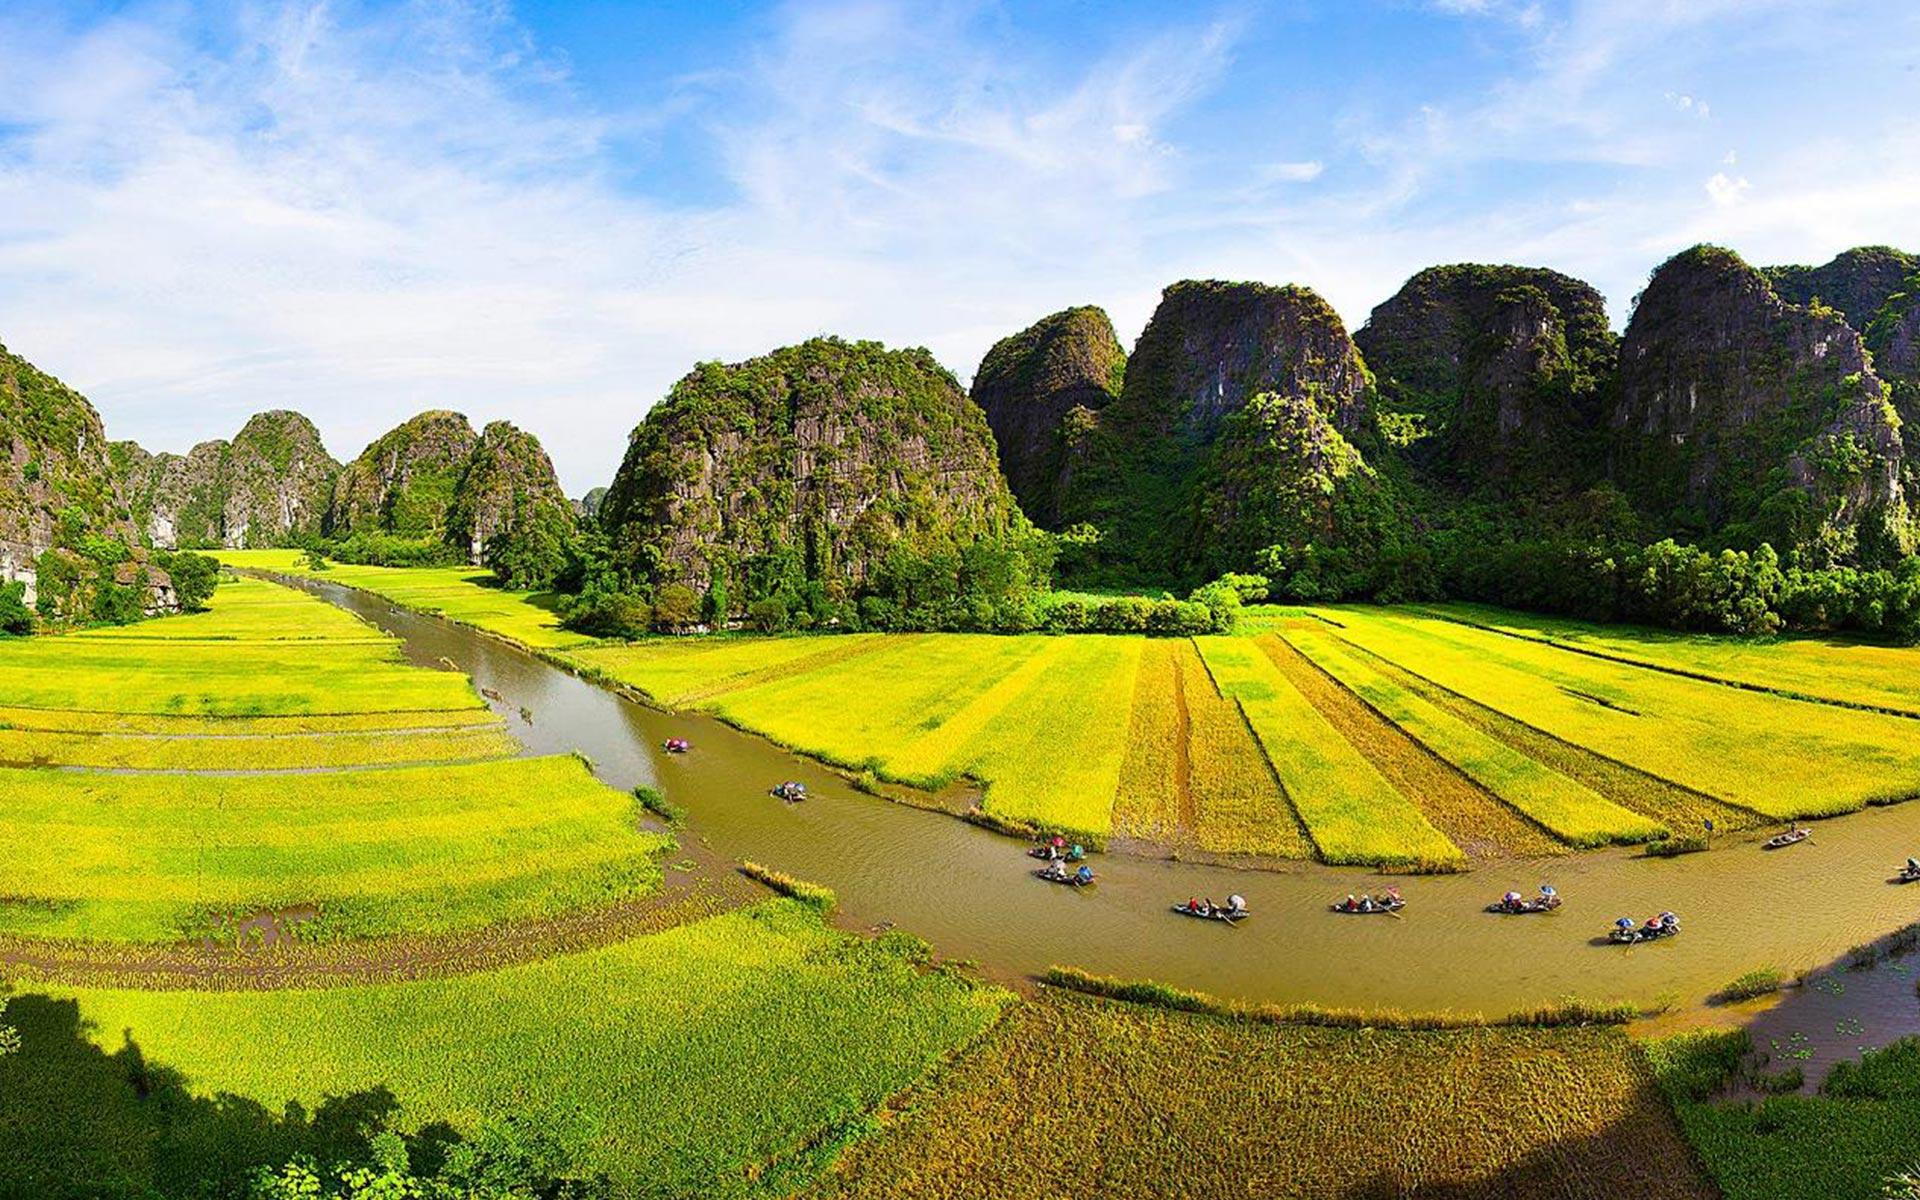 Ngo Dong river in Ninh Binh Vietnam